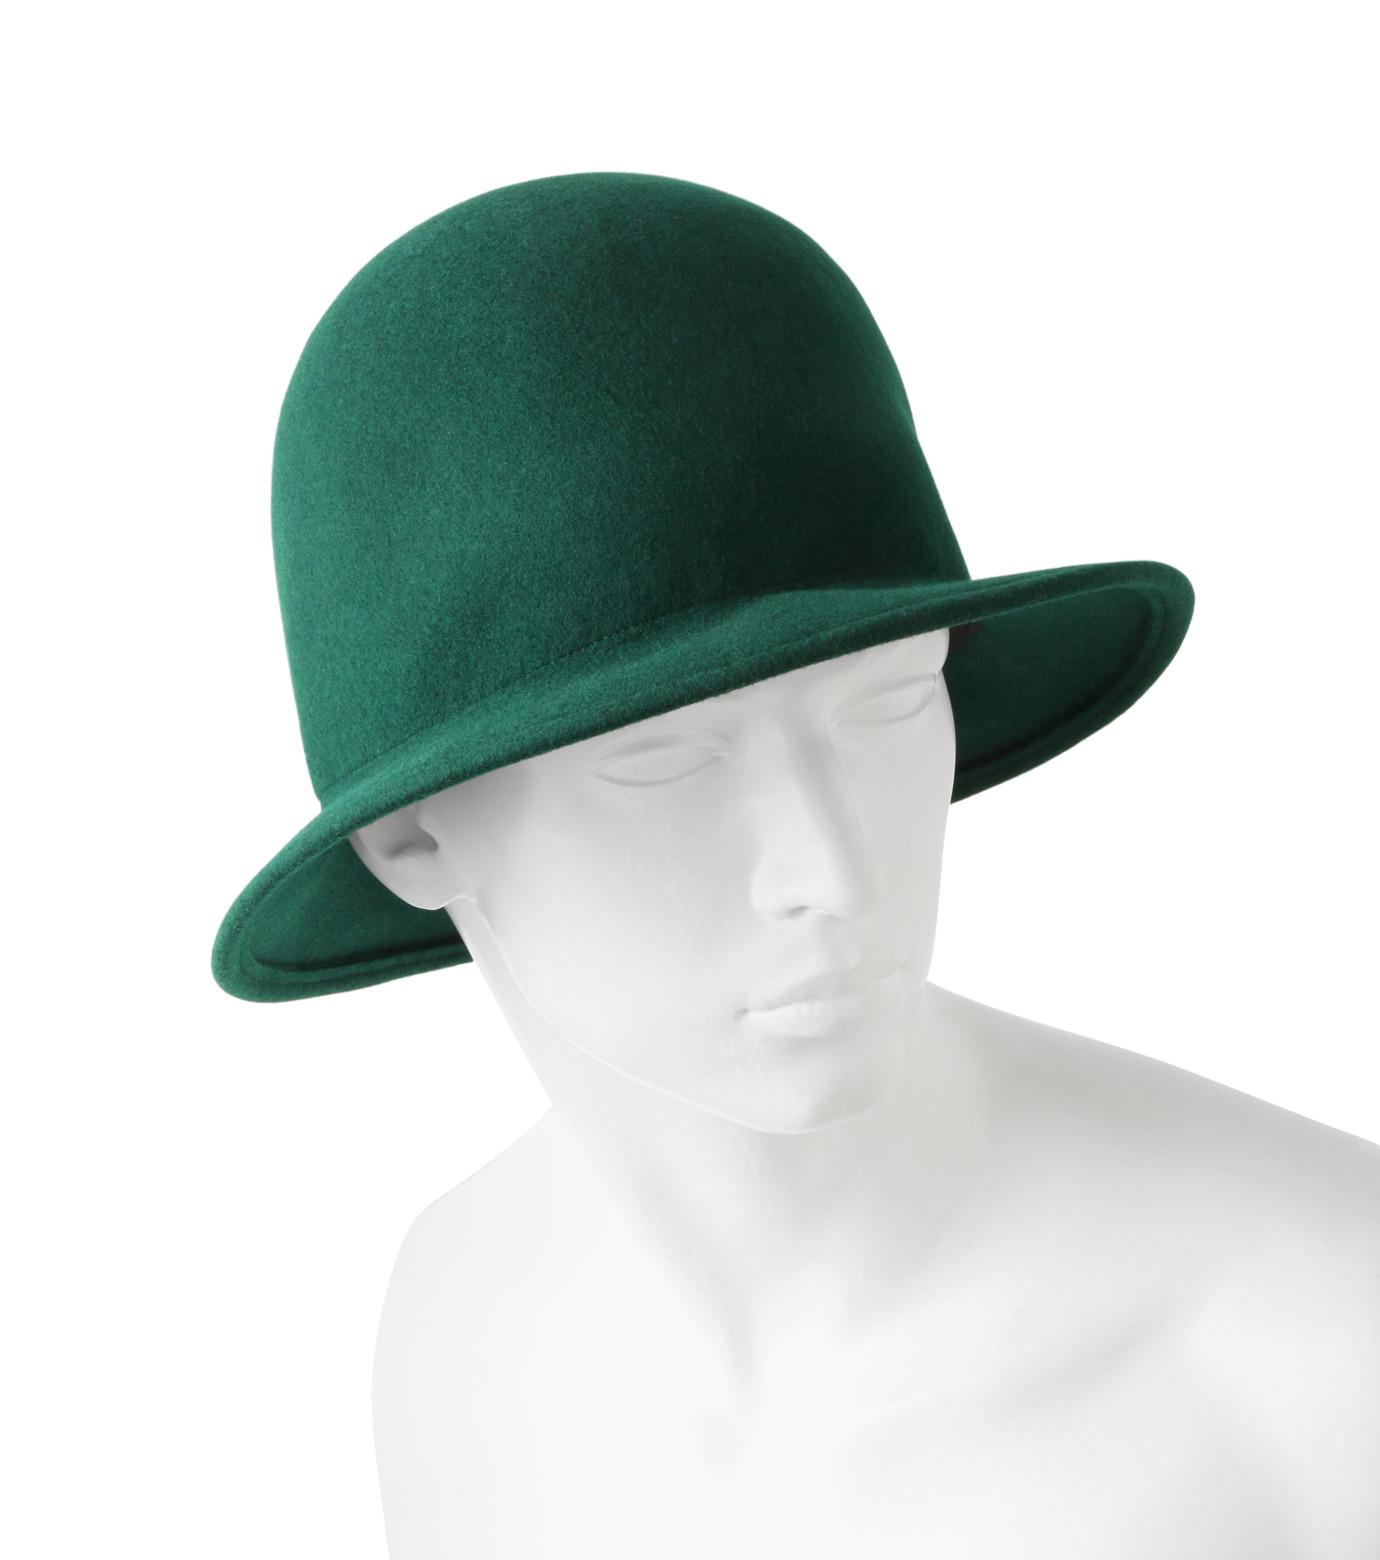 Sacai(サカイ)のHat-GREEN(キャップ/cap)-17-01274M-22 拡大詳細画像3